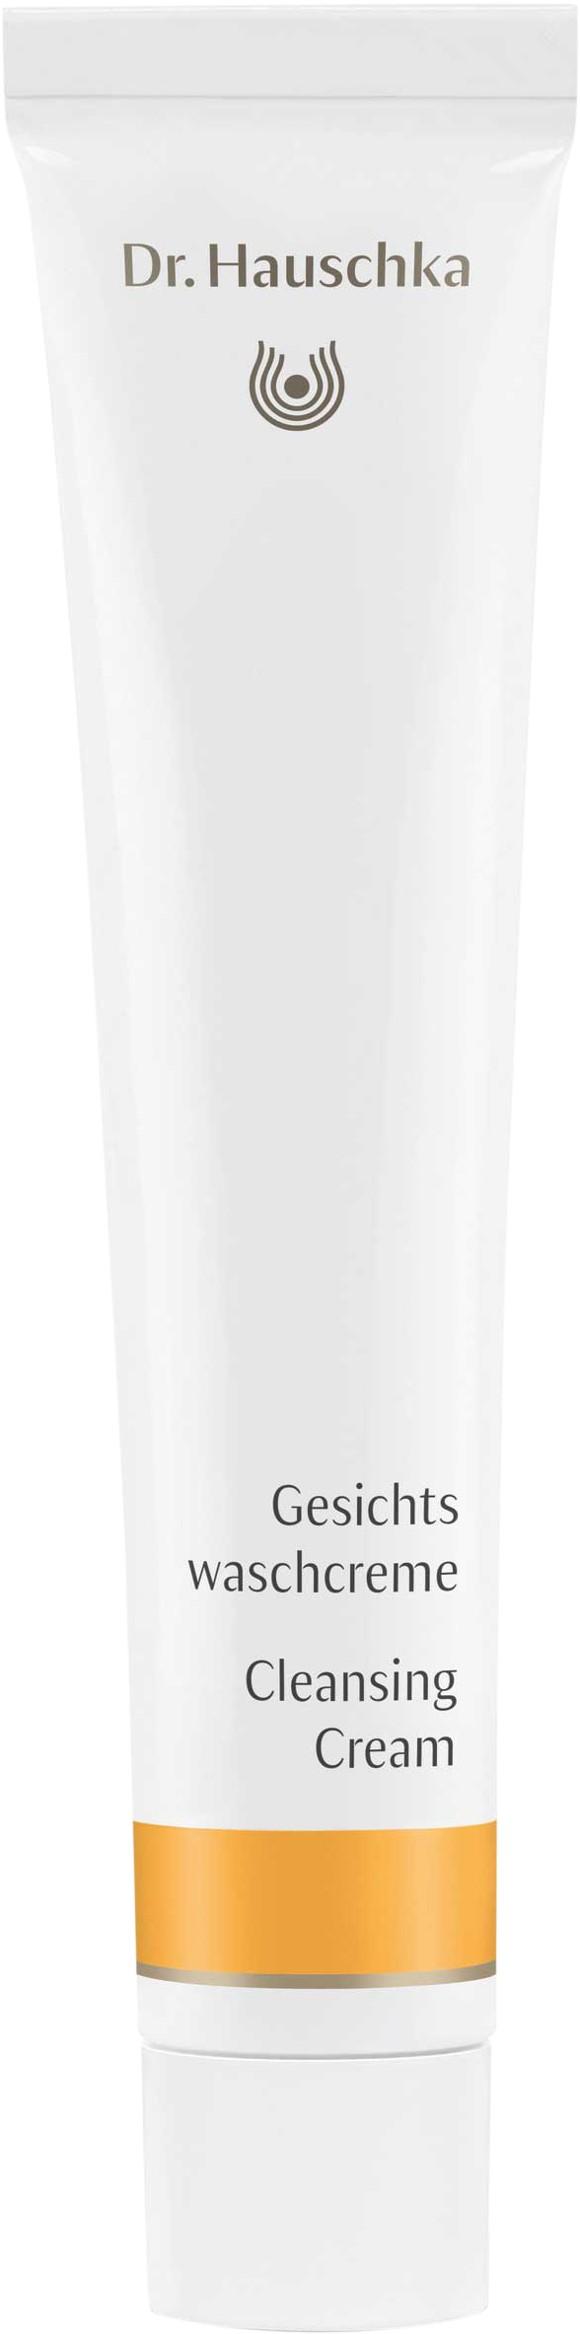 Dr. Hauschka - Rensecreme 50 ml